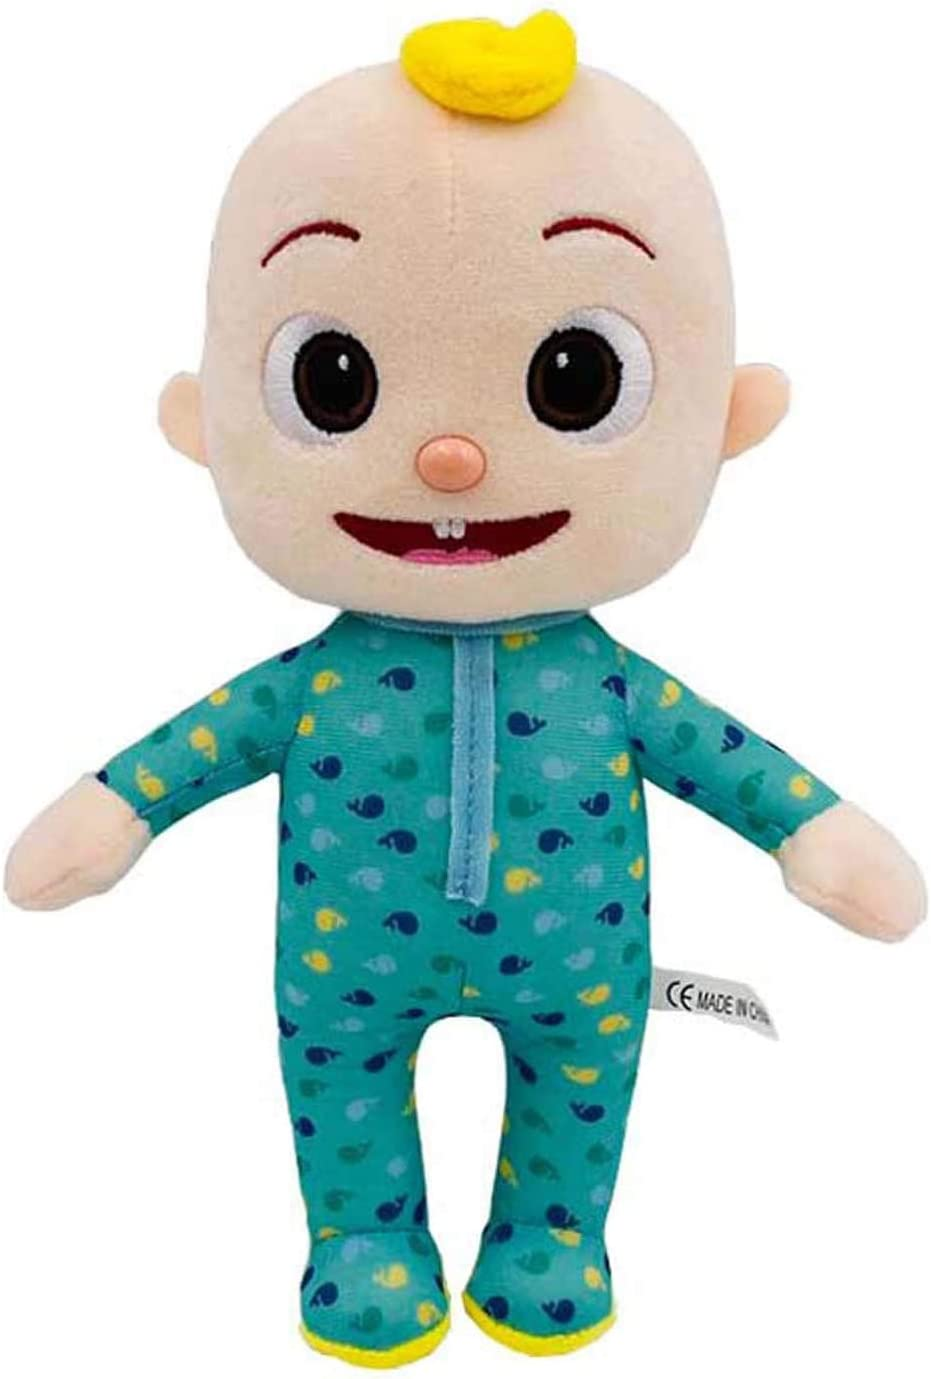 FURUDONGHAI Cocomelon Toys JJ Plush Toy for Boy Girl Soft Stuffed Kids Birthday Gift Toys